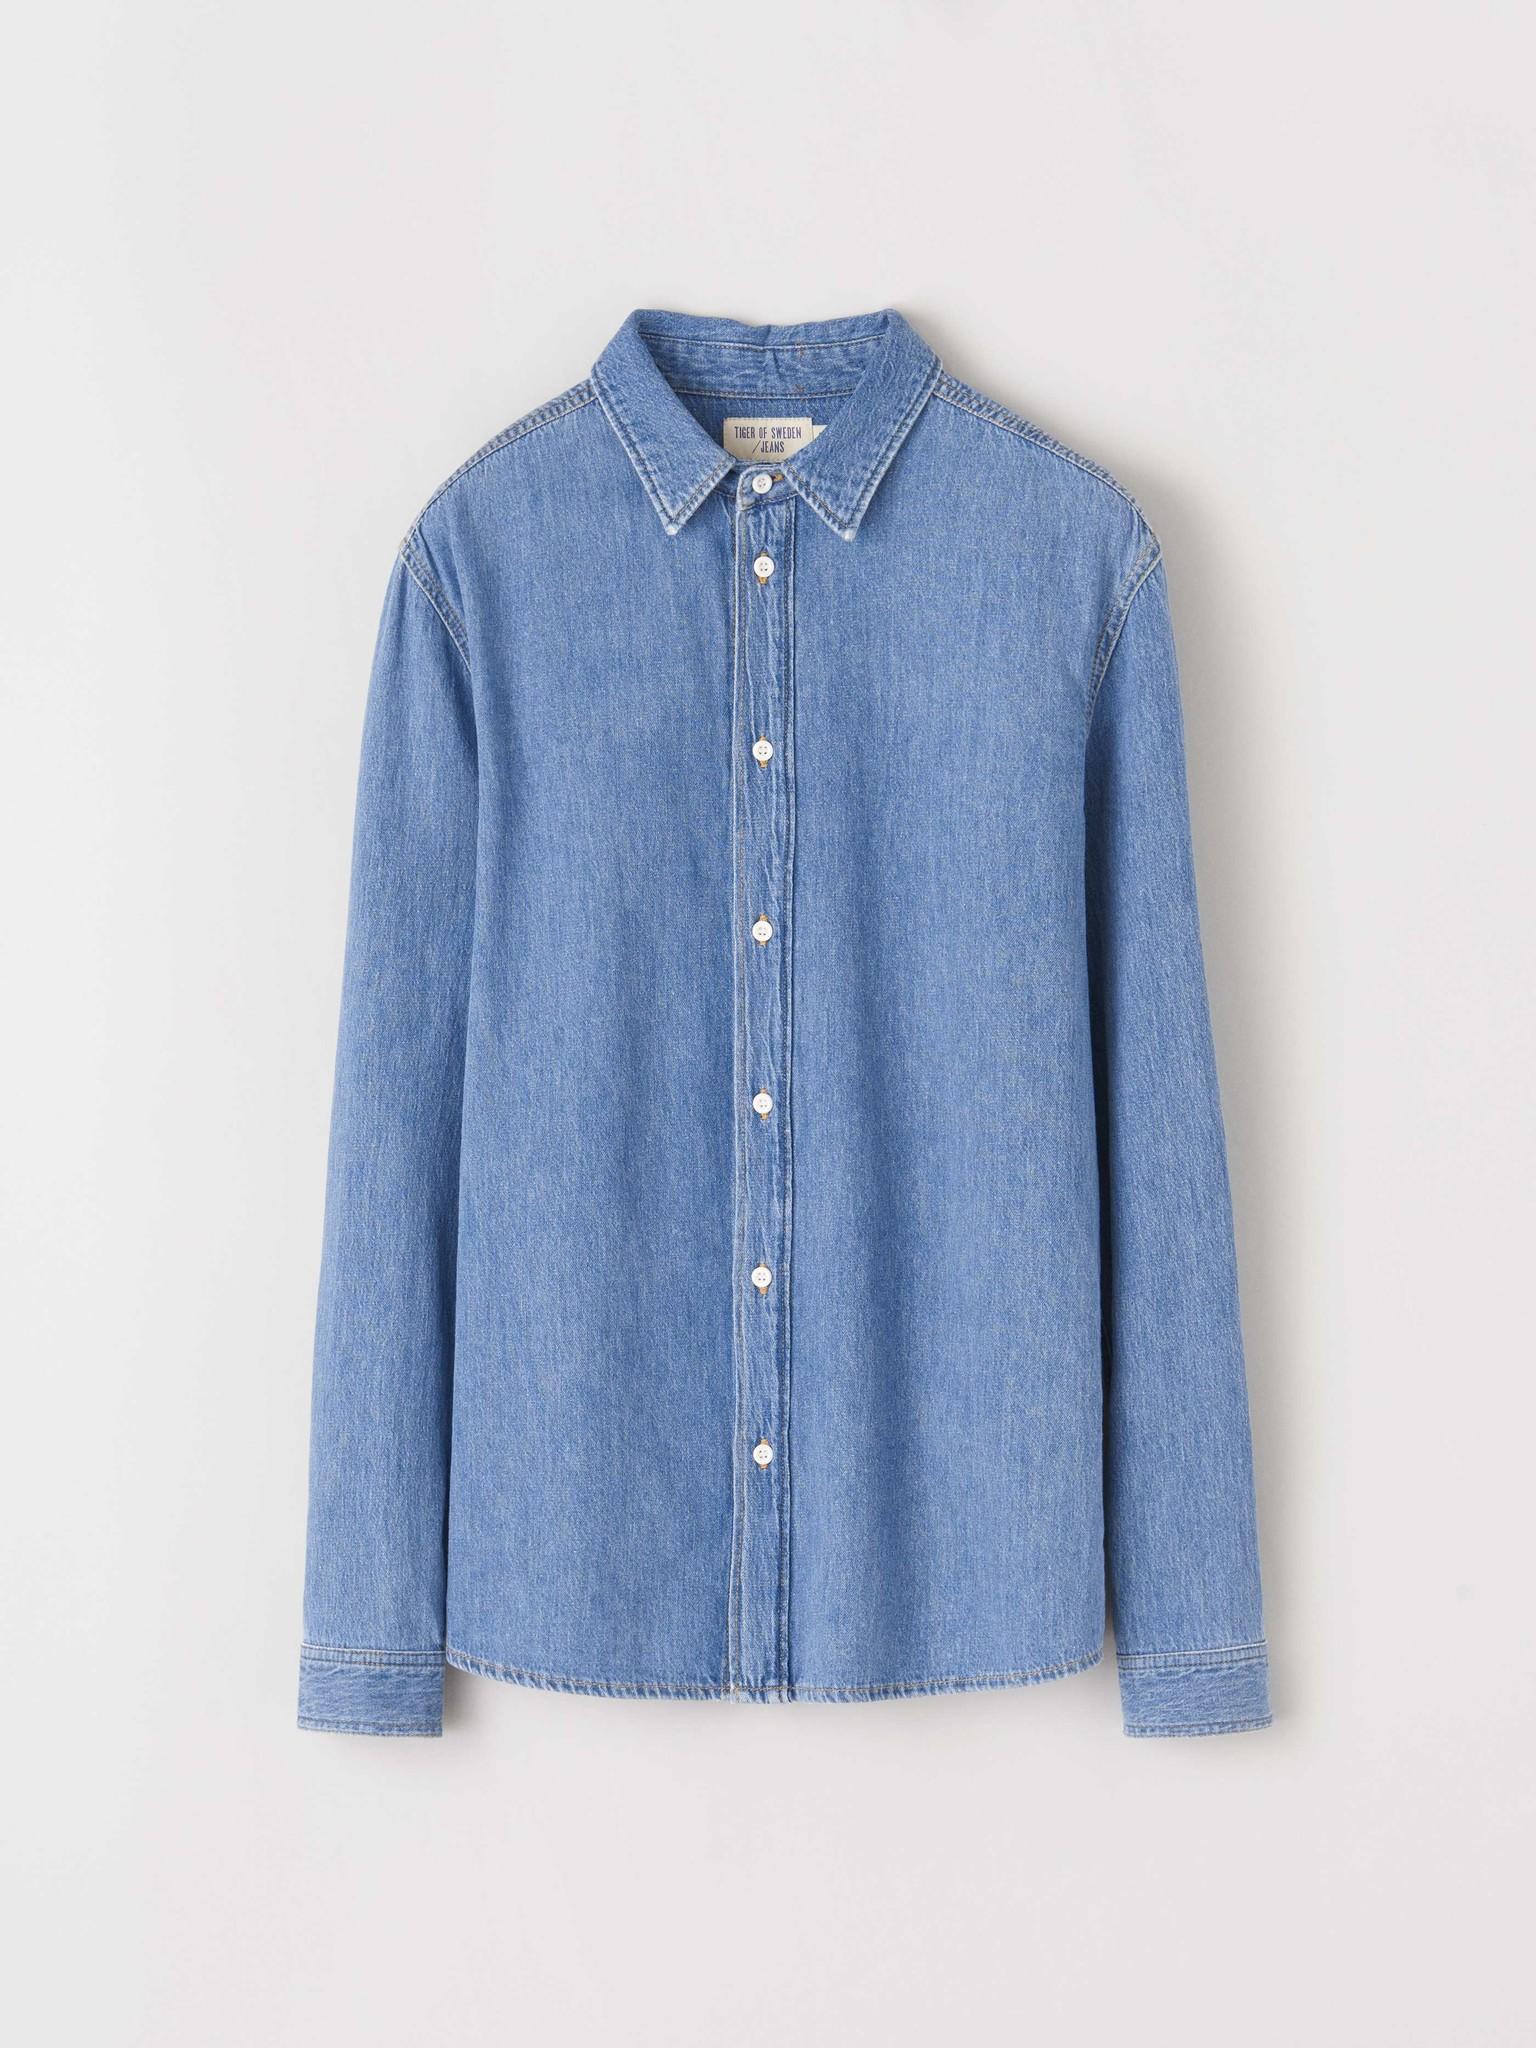 Pure NP. Lichtblauw Jeans Shirt-1